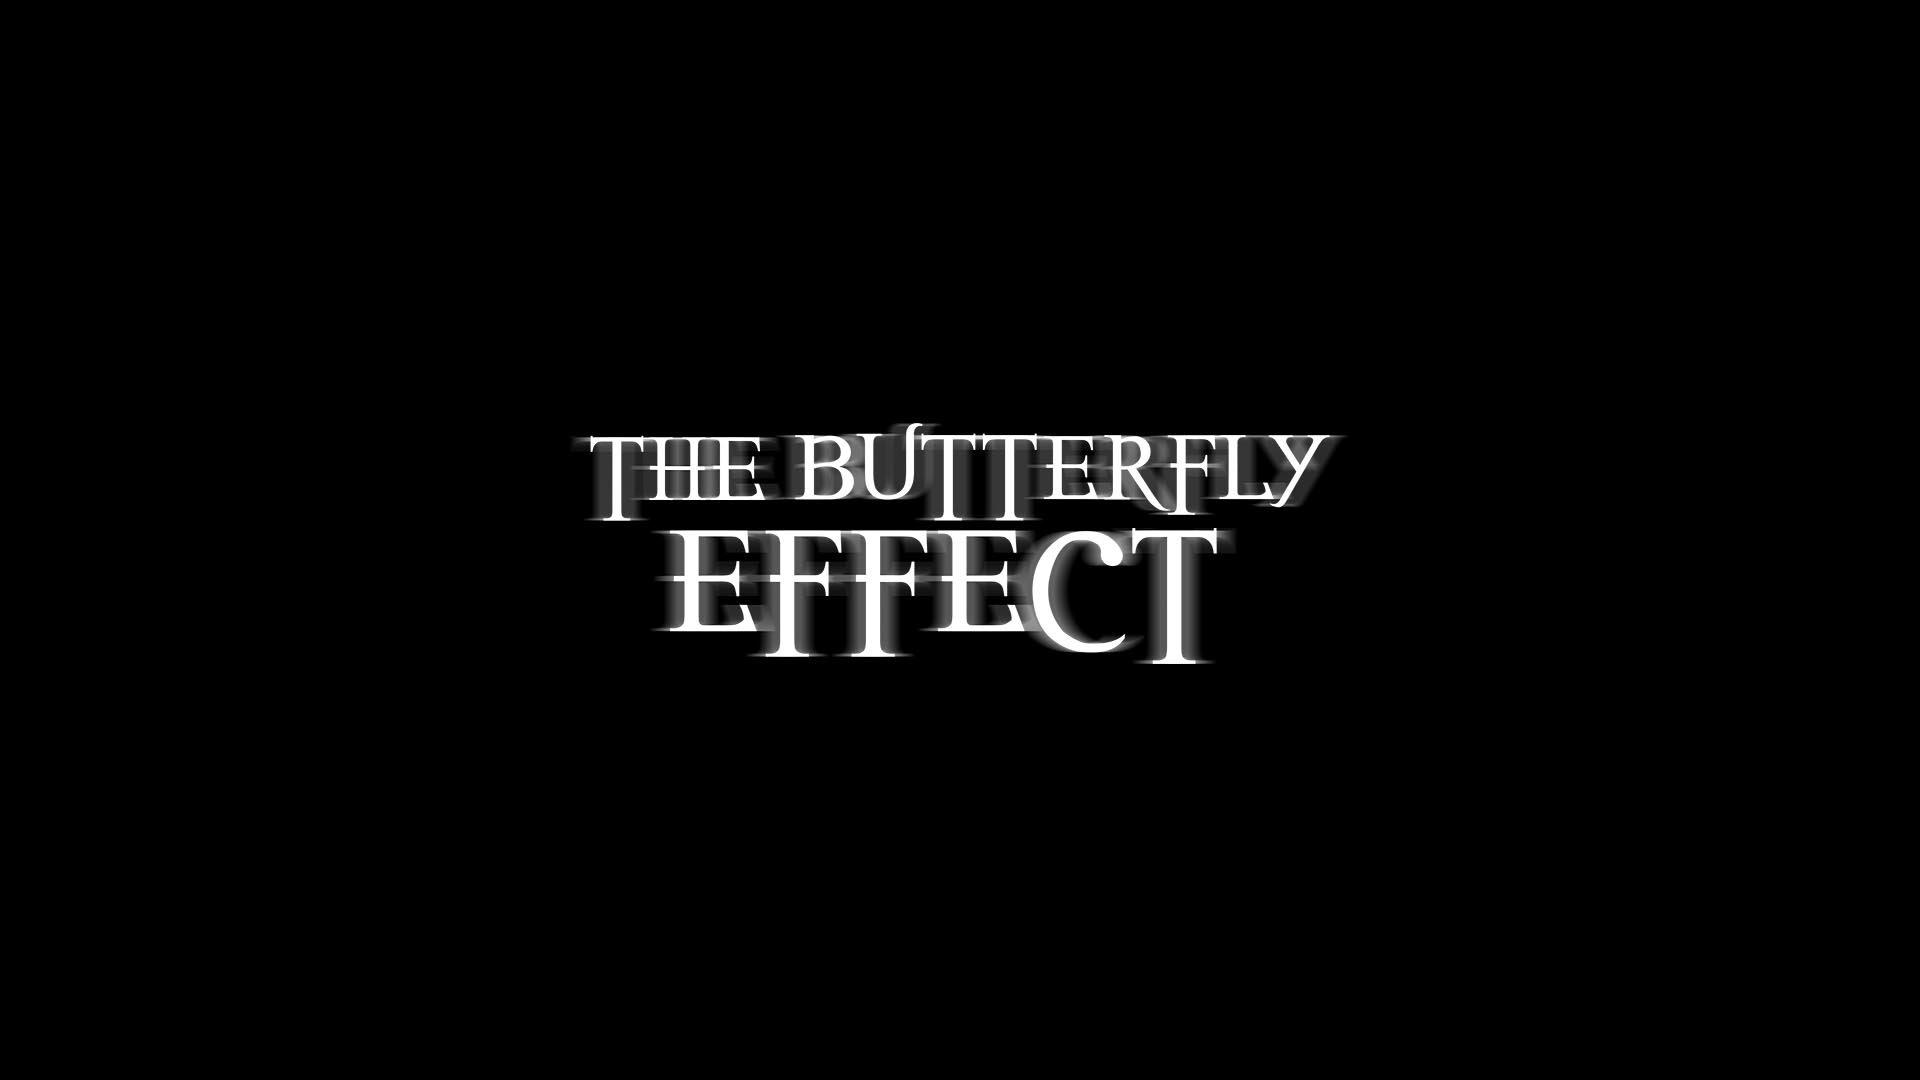 kelebek-etkisi-kapak-resmi